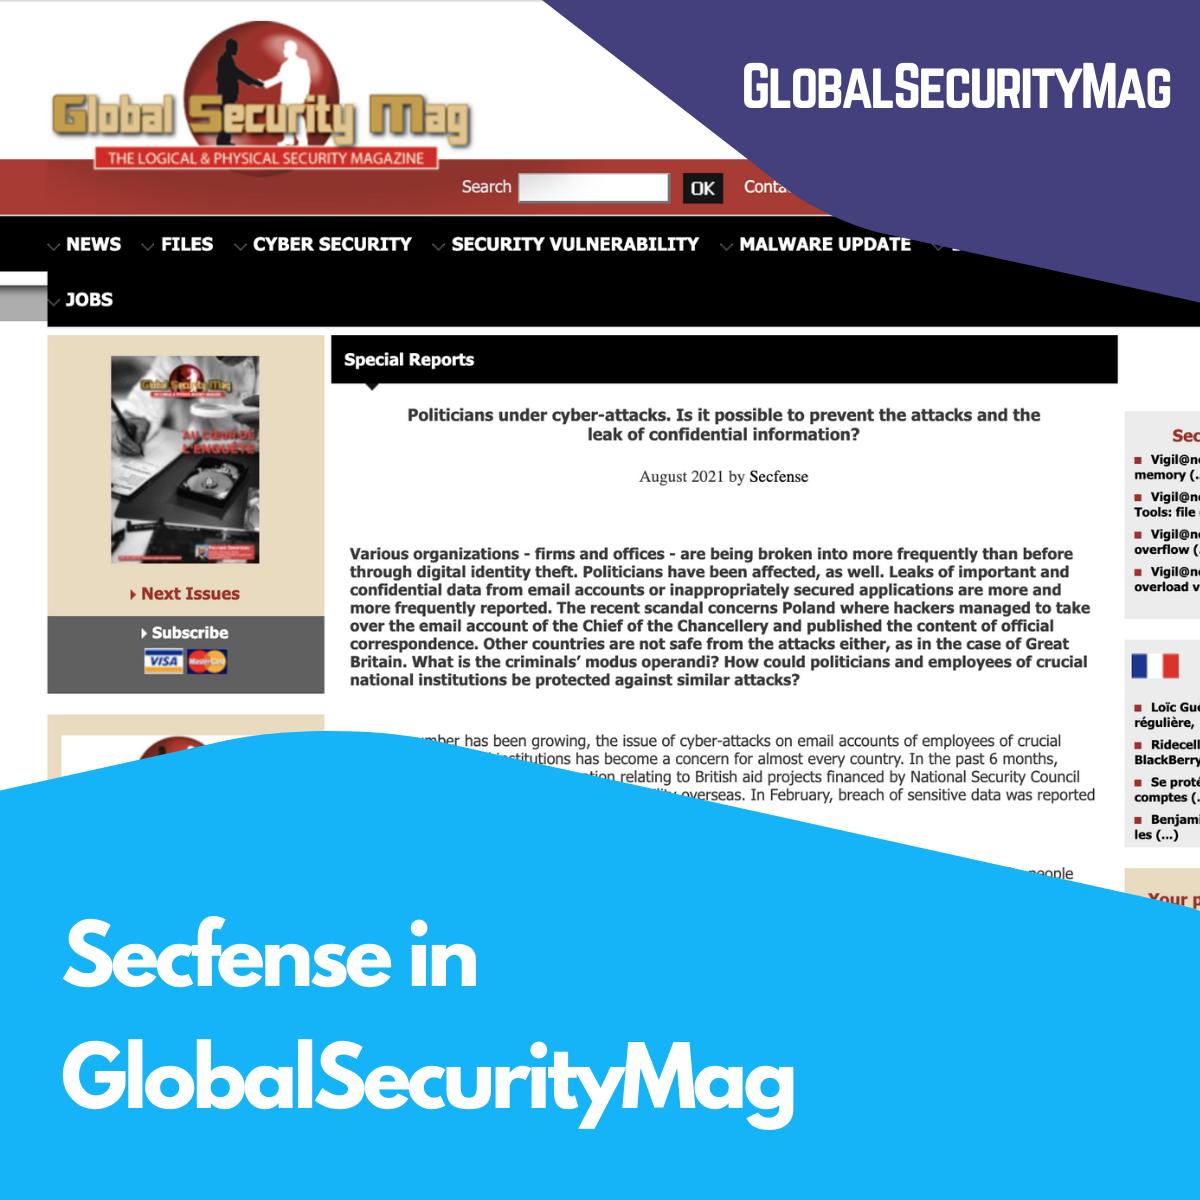 Secfense in GlobalSecurityMag